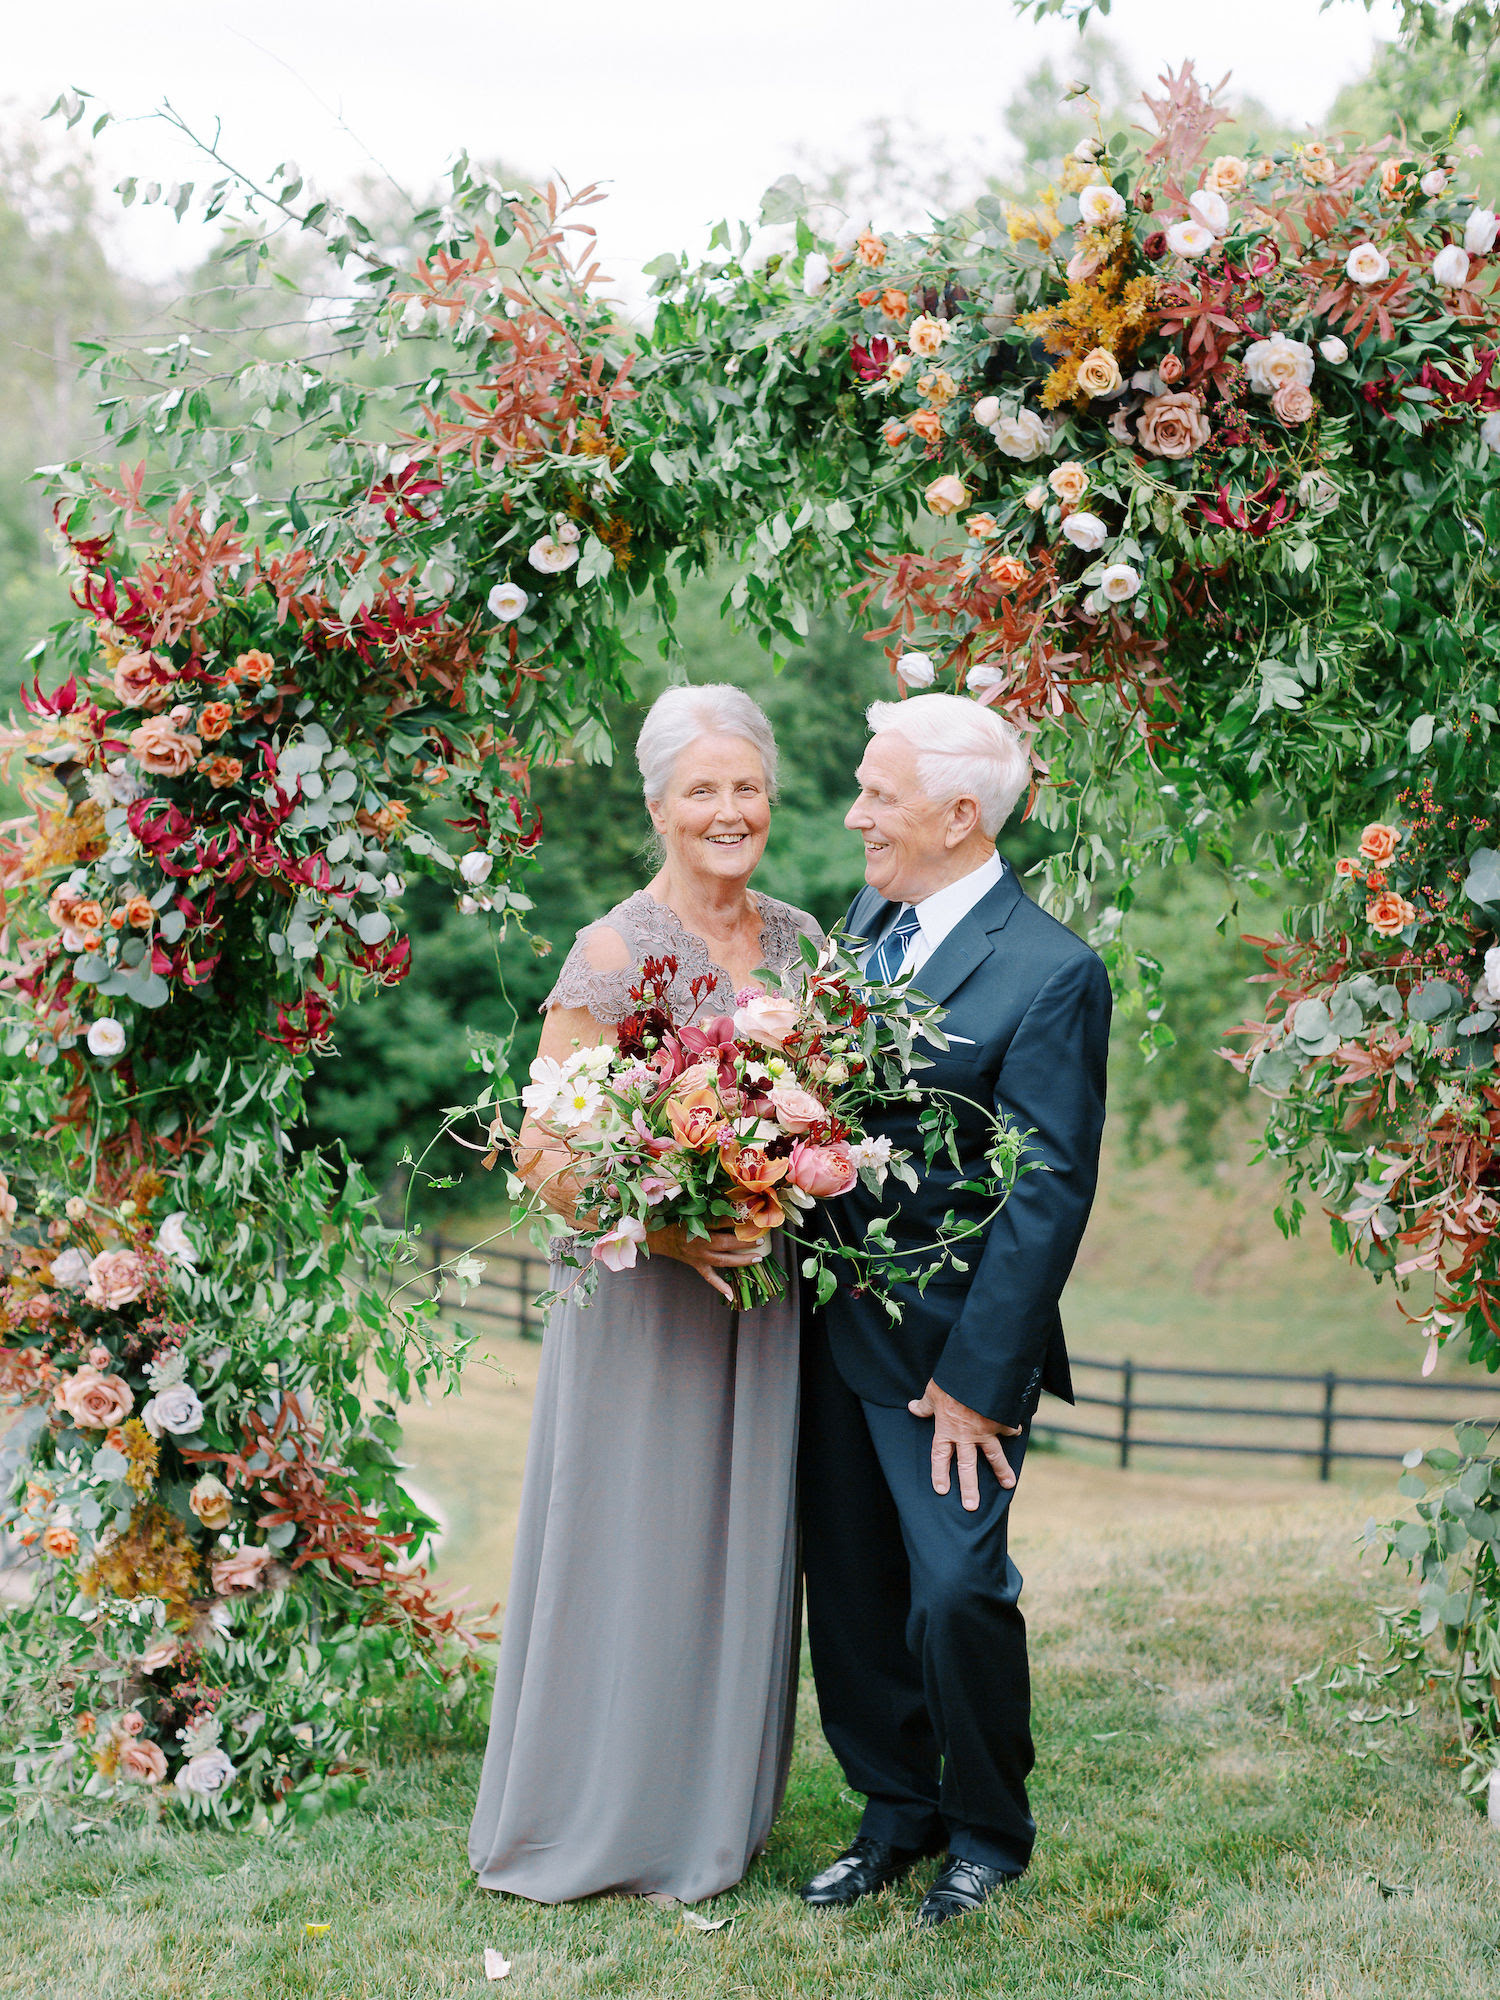 A Special 60th Wedding Anniversary Party Rachel A Clingen Wedding Event Design